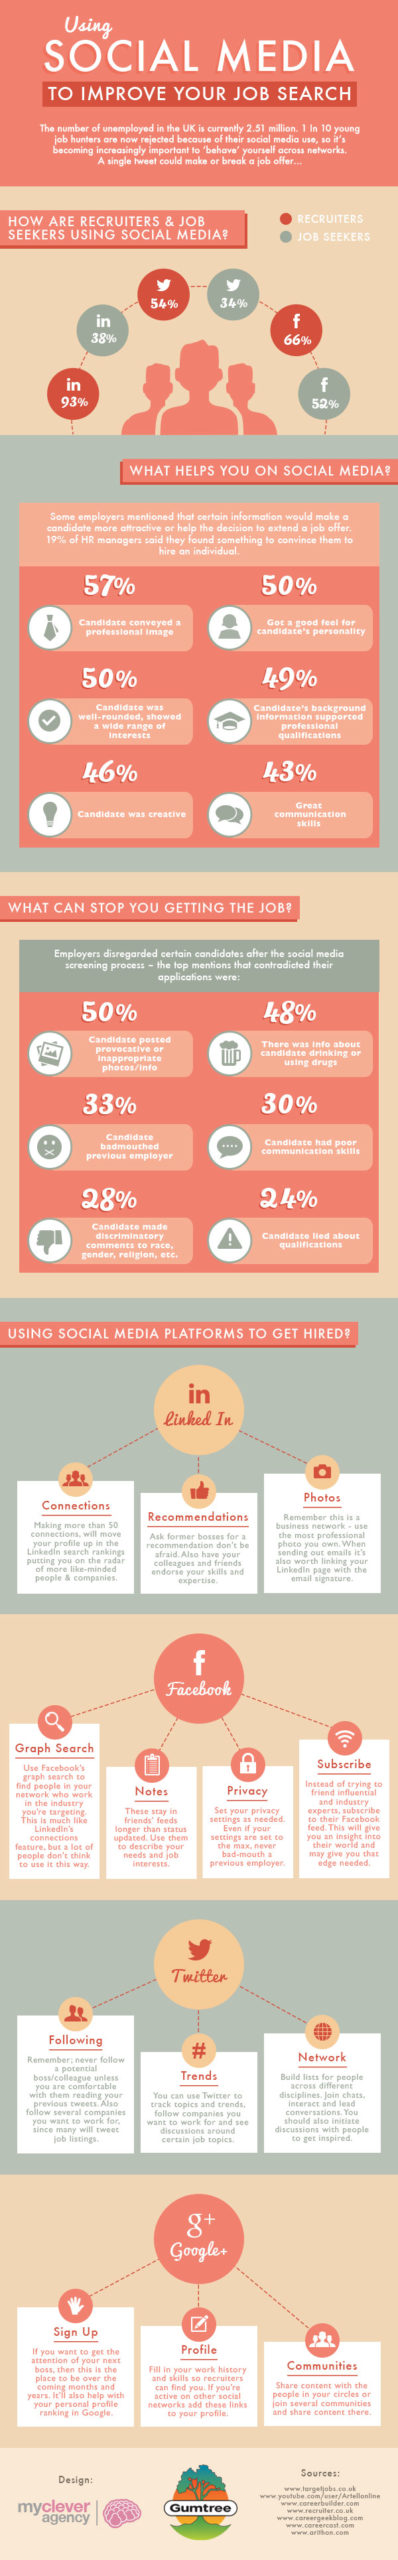 social media job search info graphic